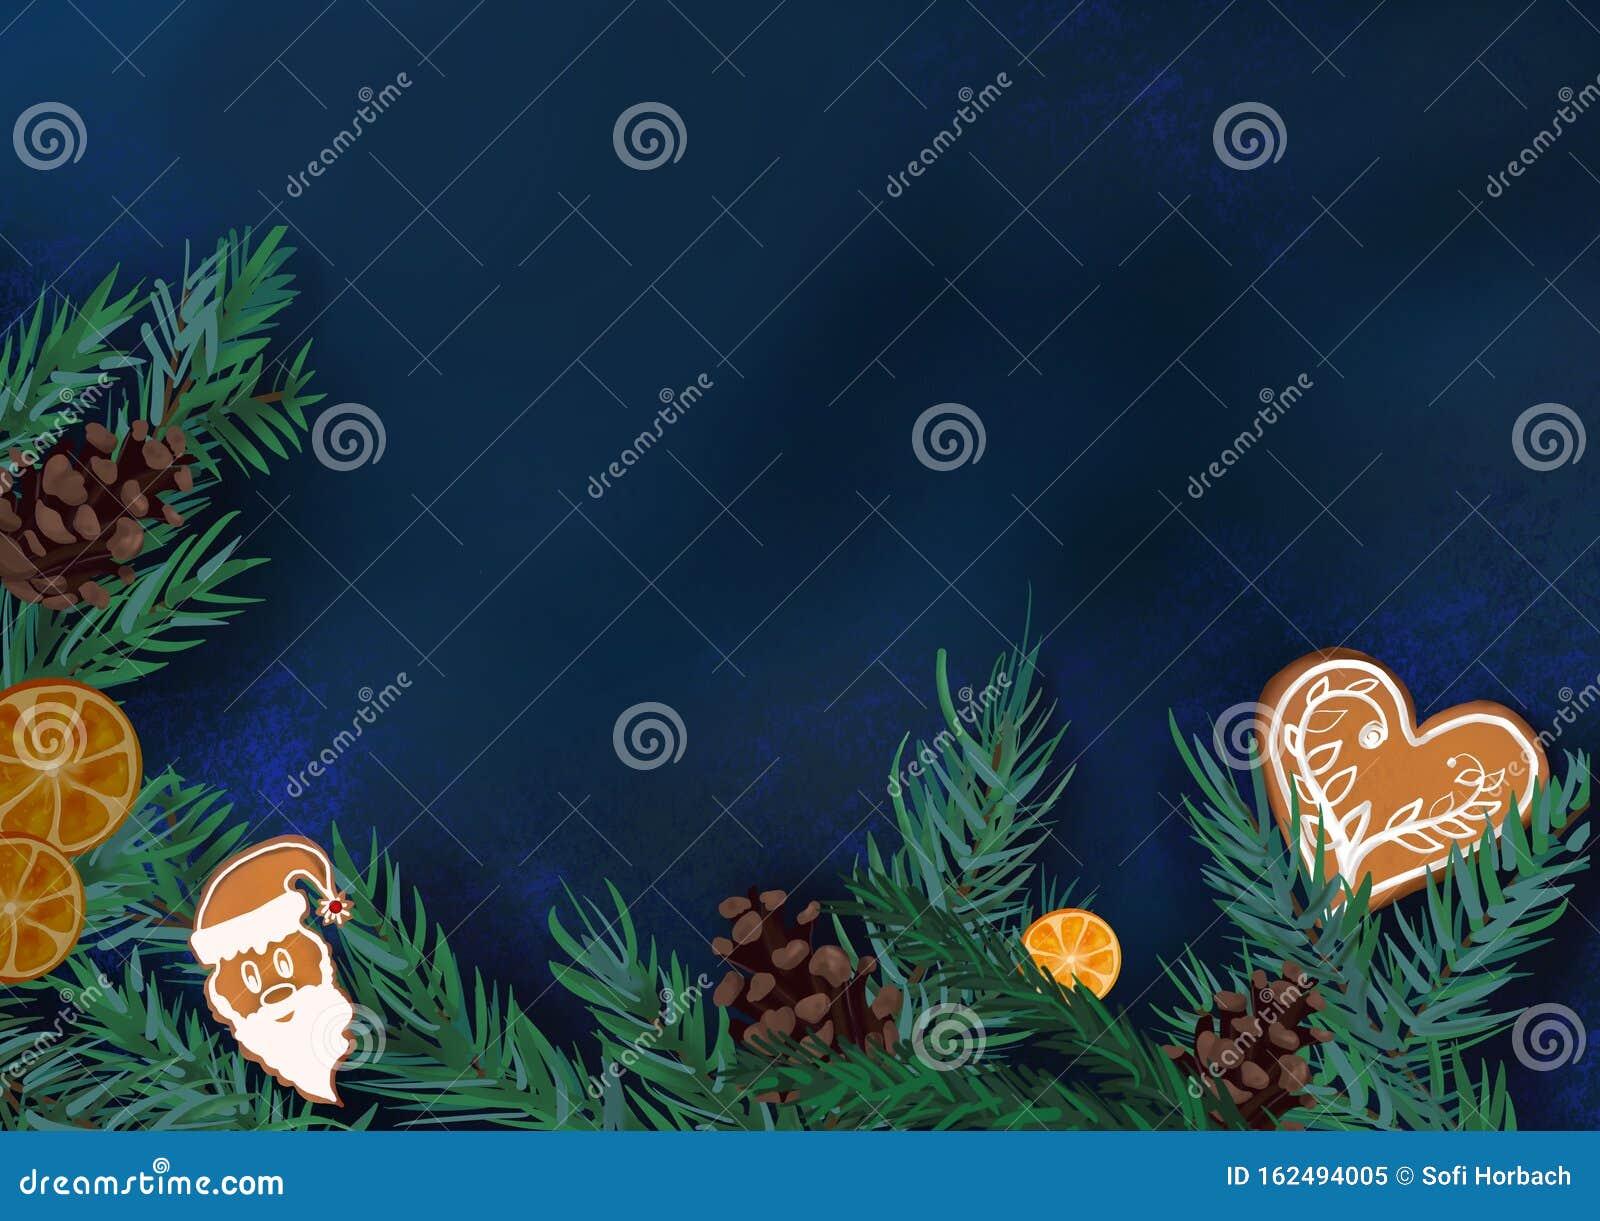 winter christmas wallpaper background design winter christmas wallpaper background design christmas tree orange 162494005